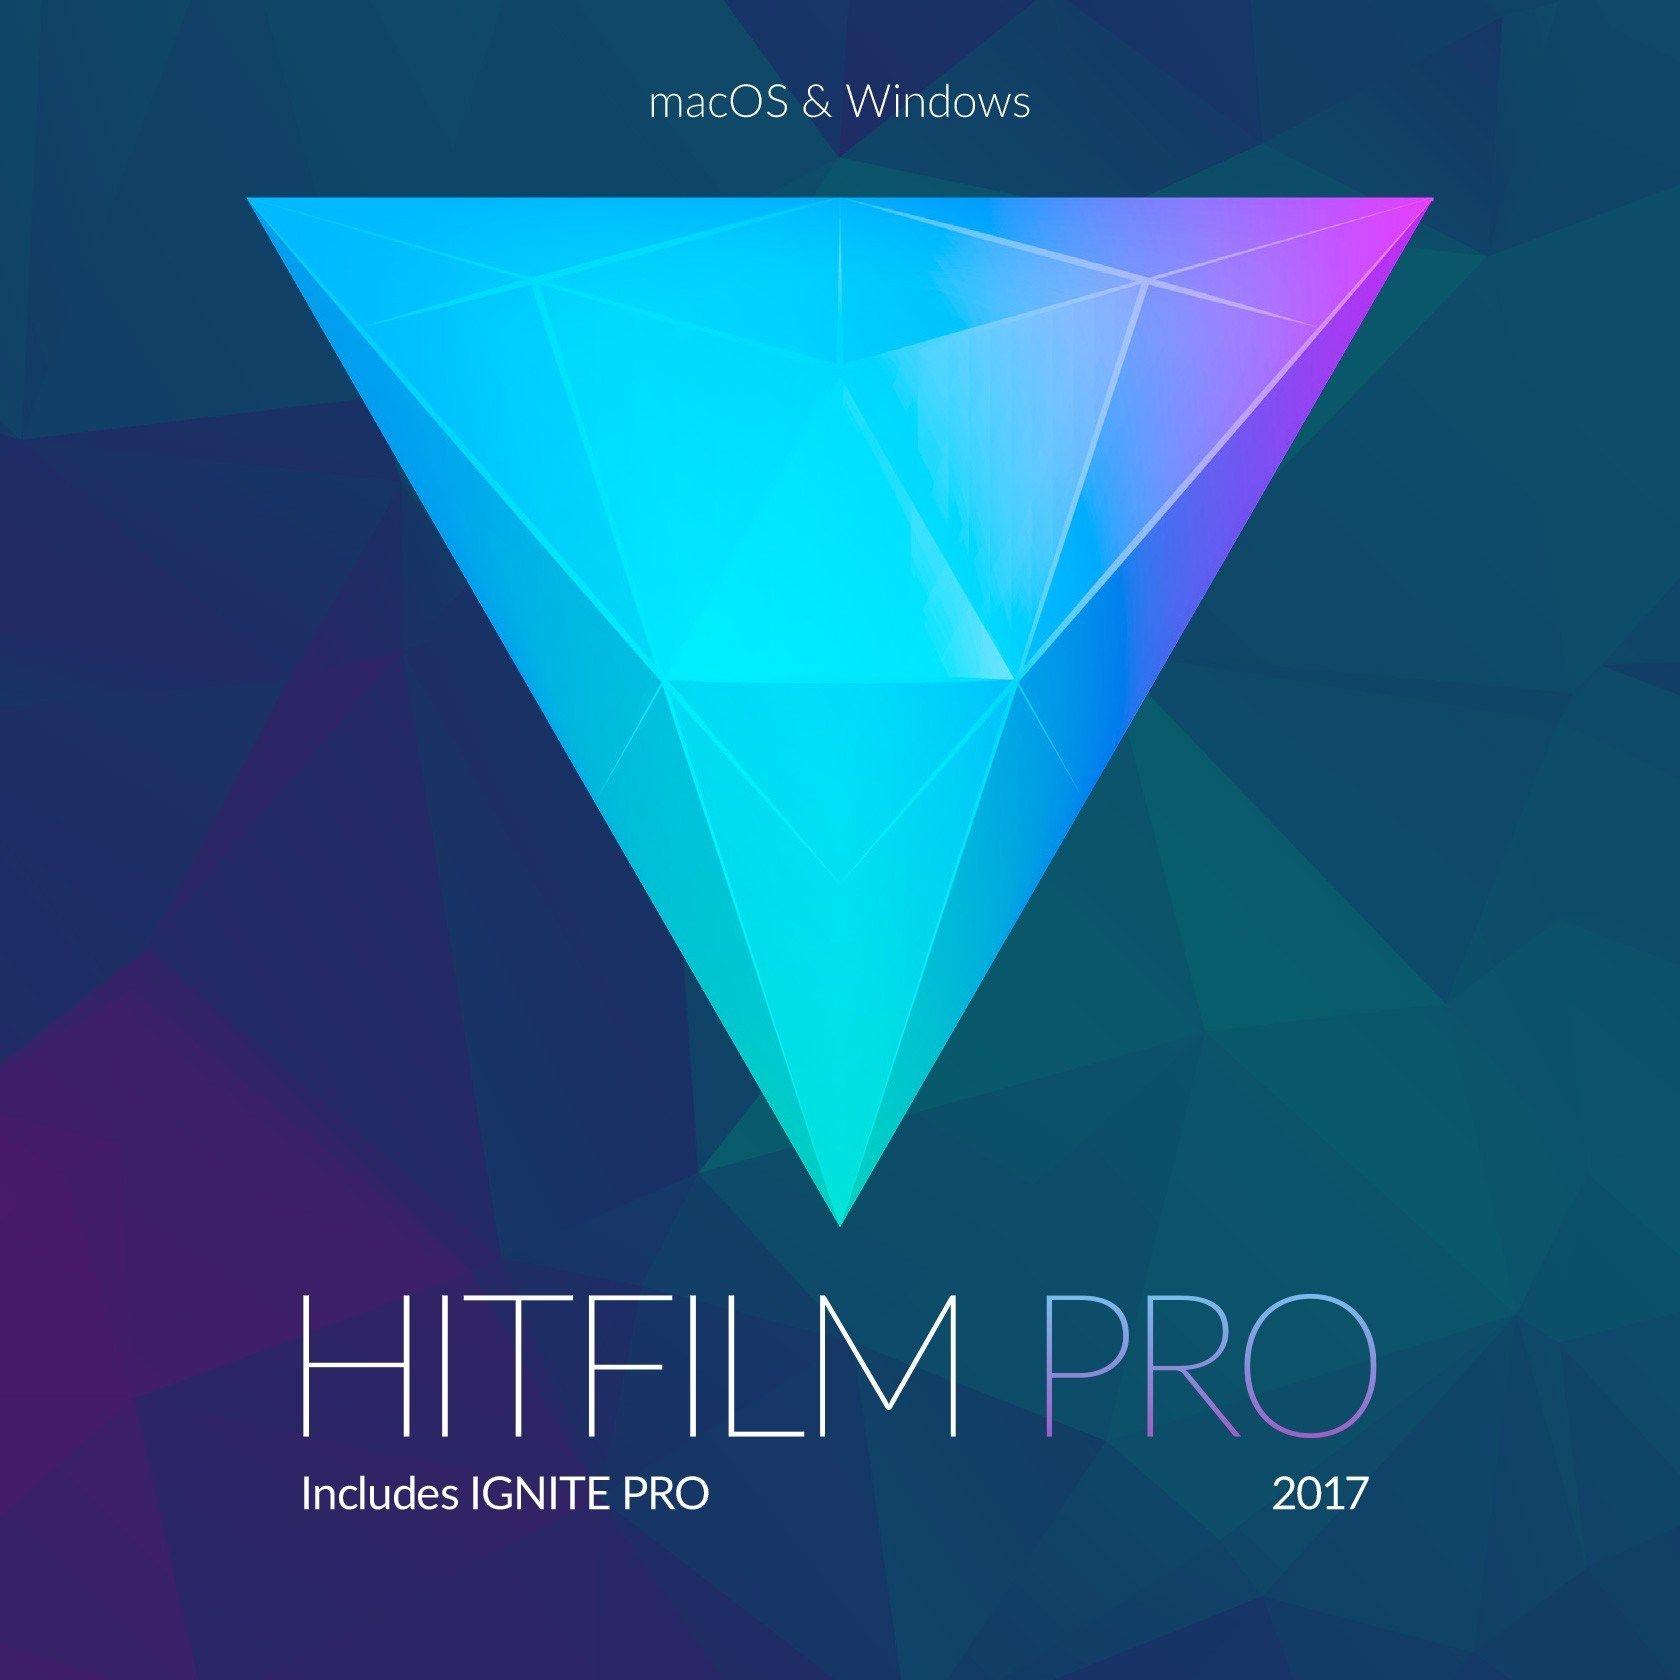 hitfilm pro 2017 serial key